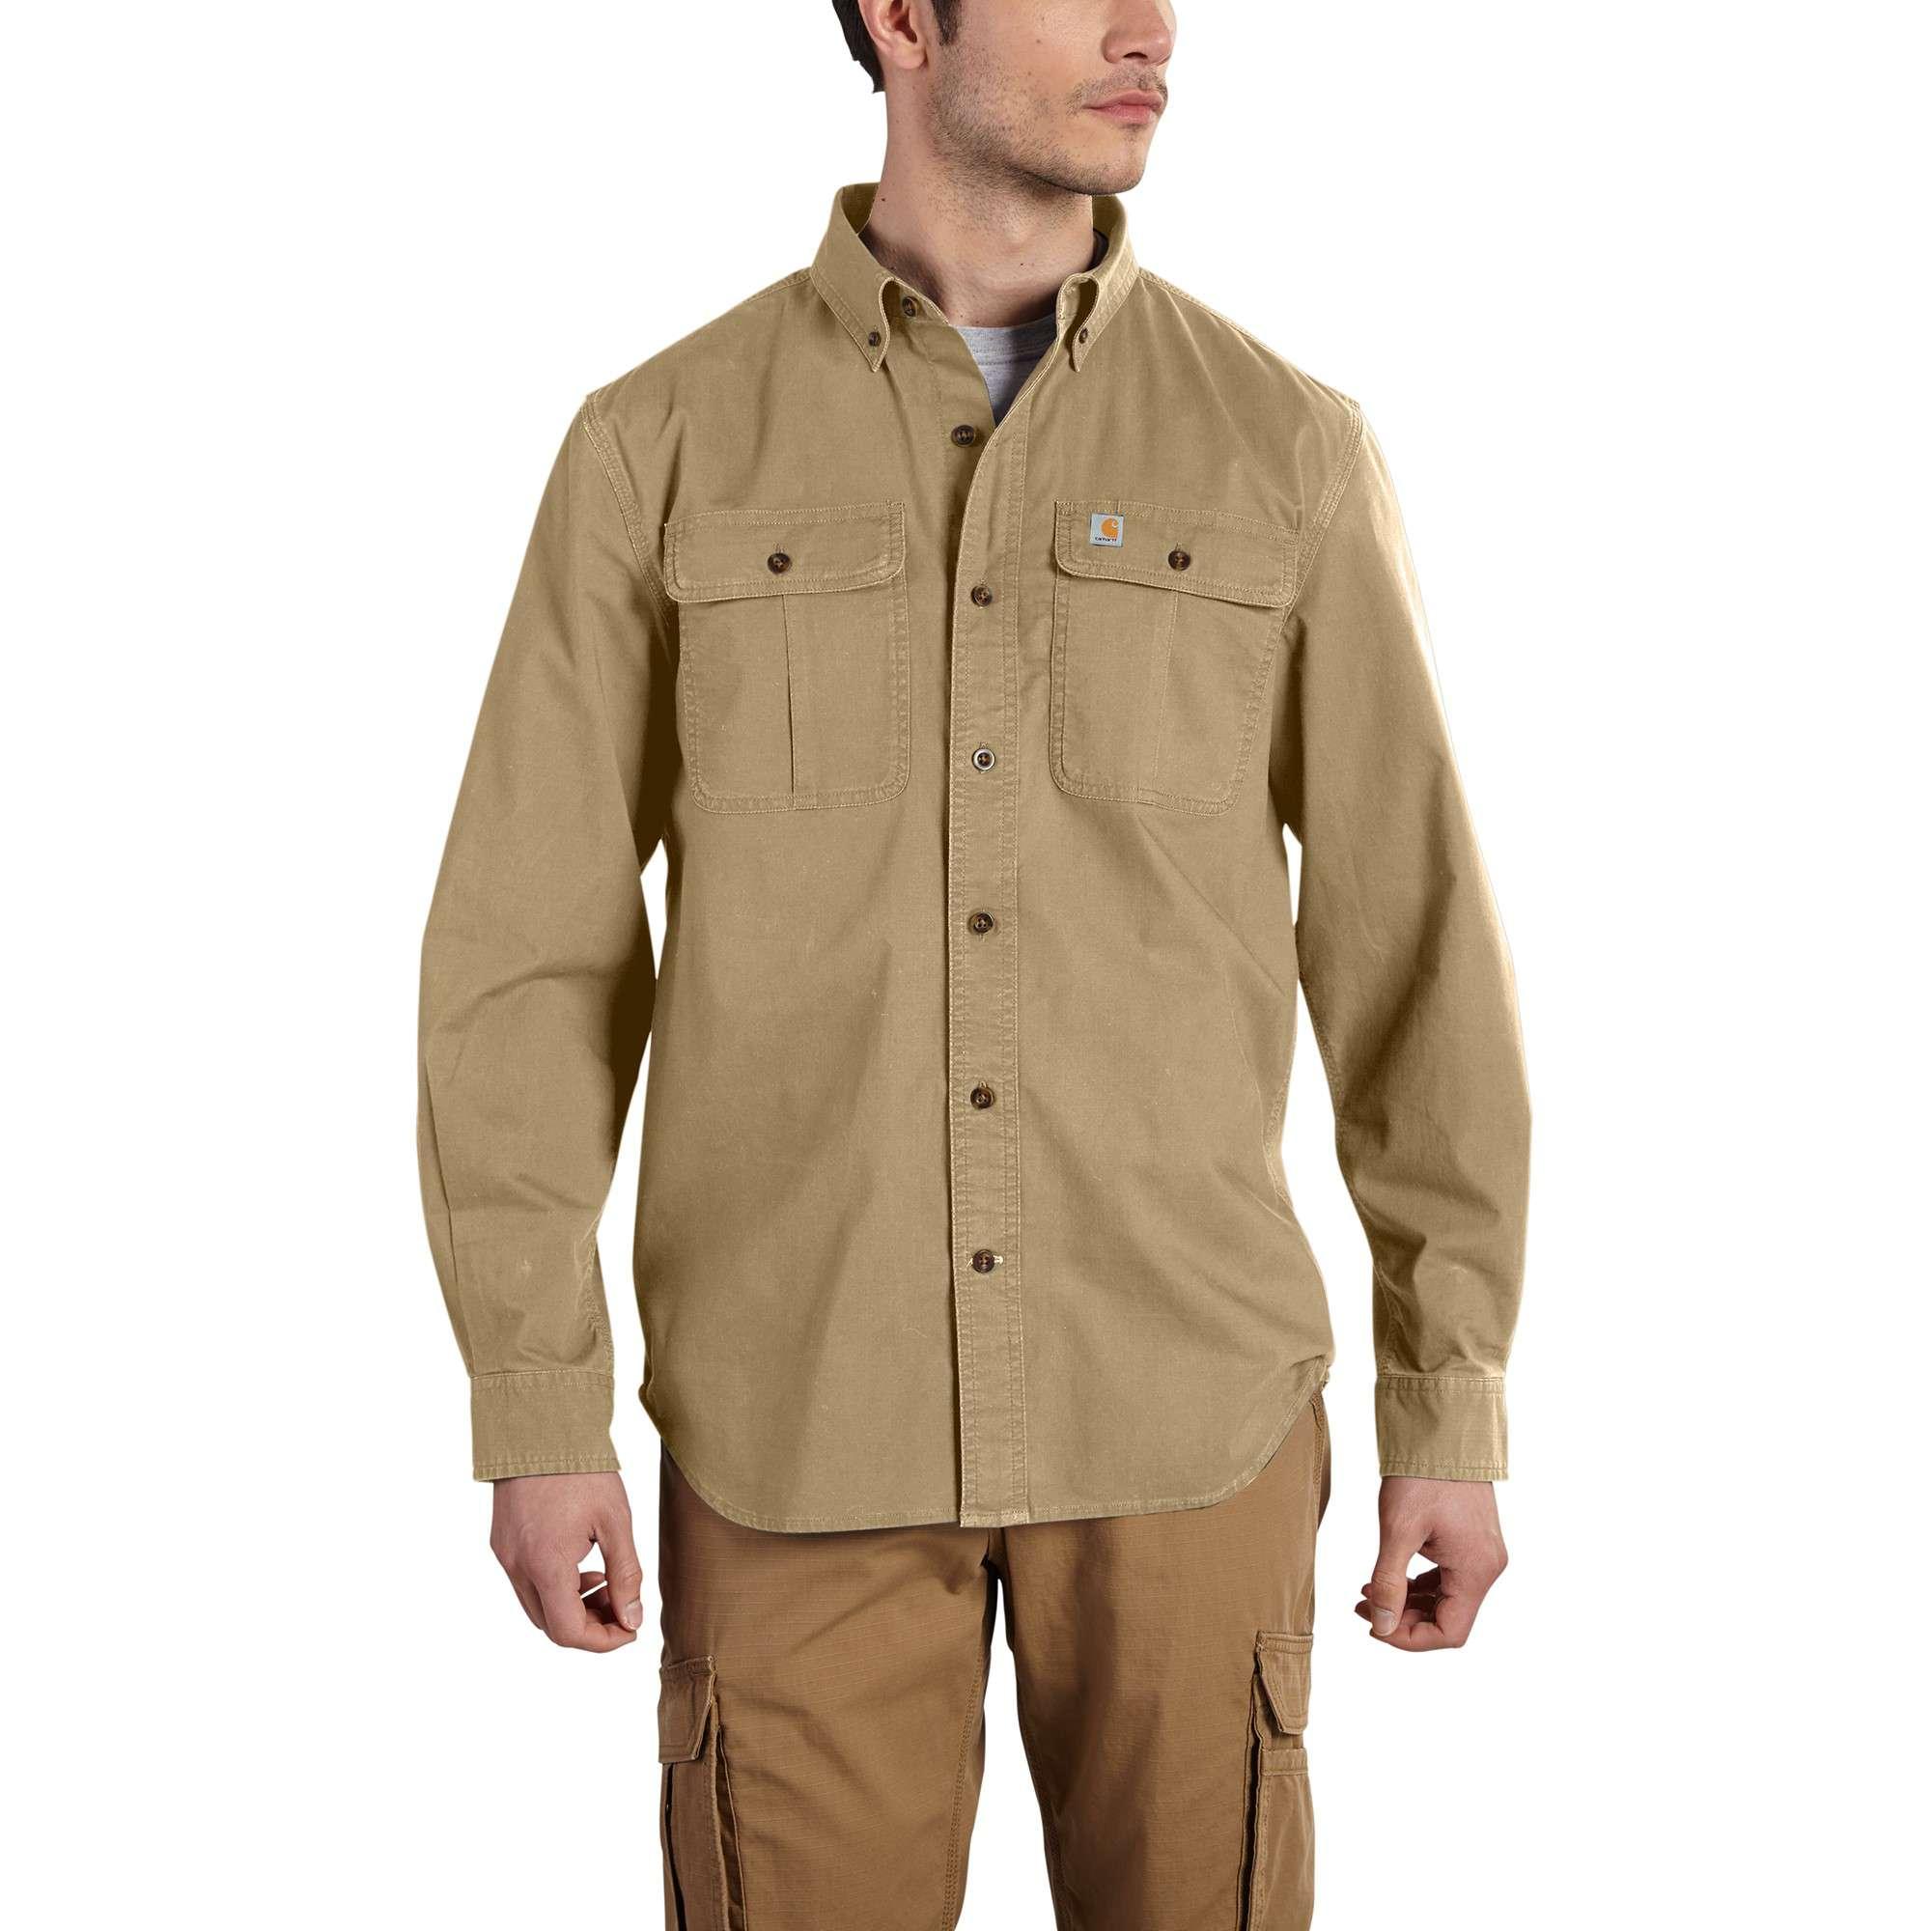 Carhartt Foreman Solid Long-sleeve Work Shirt